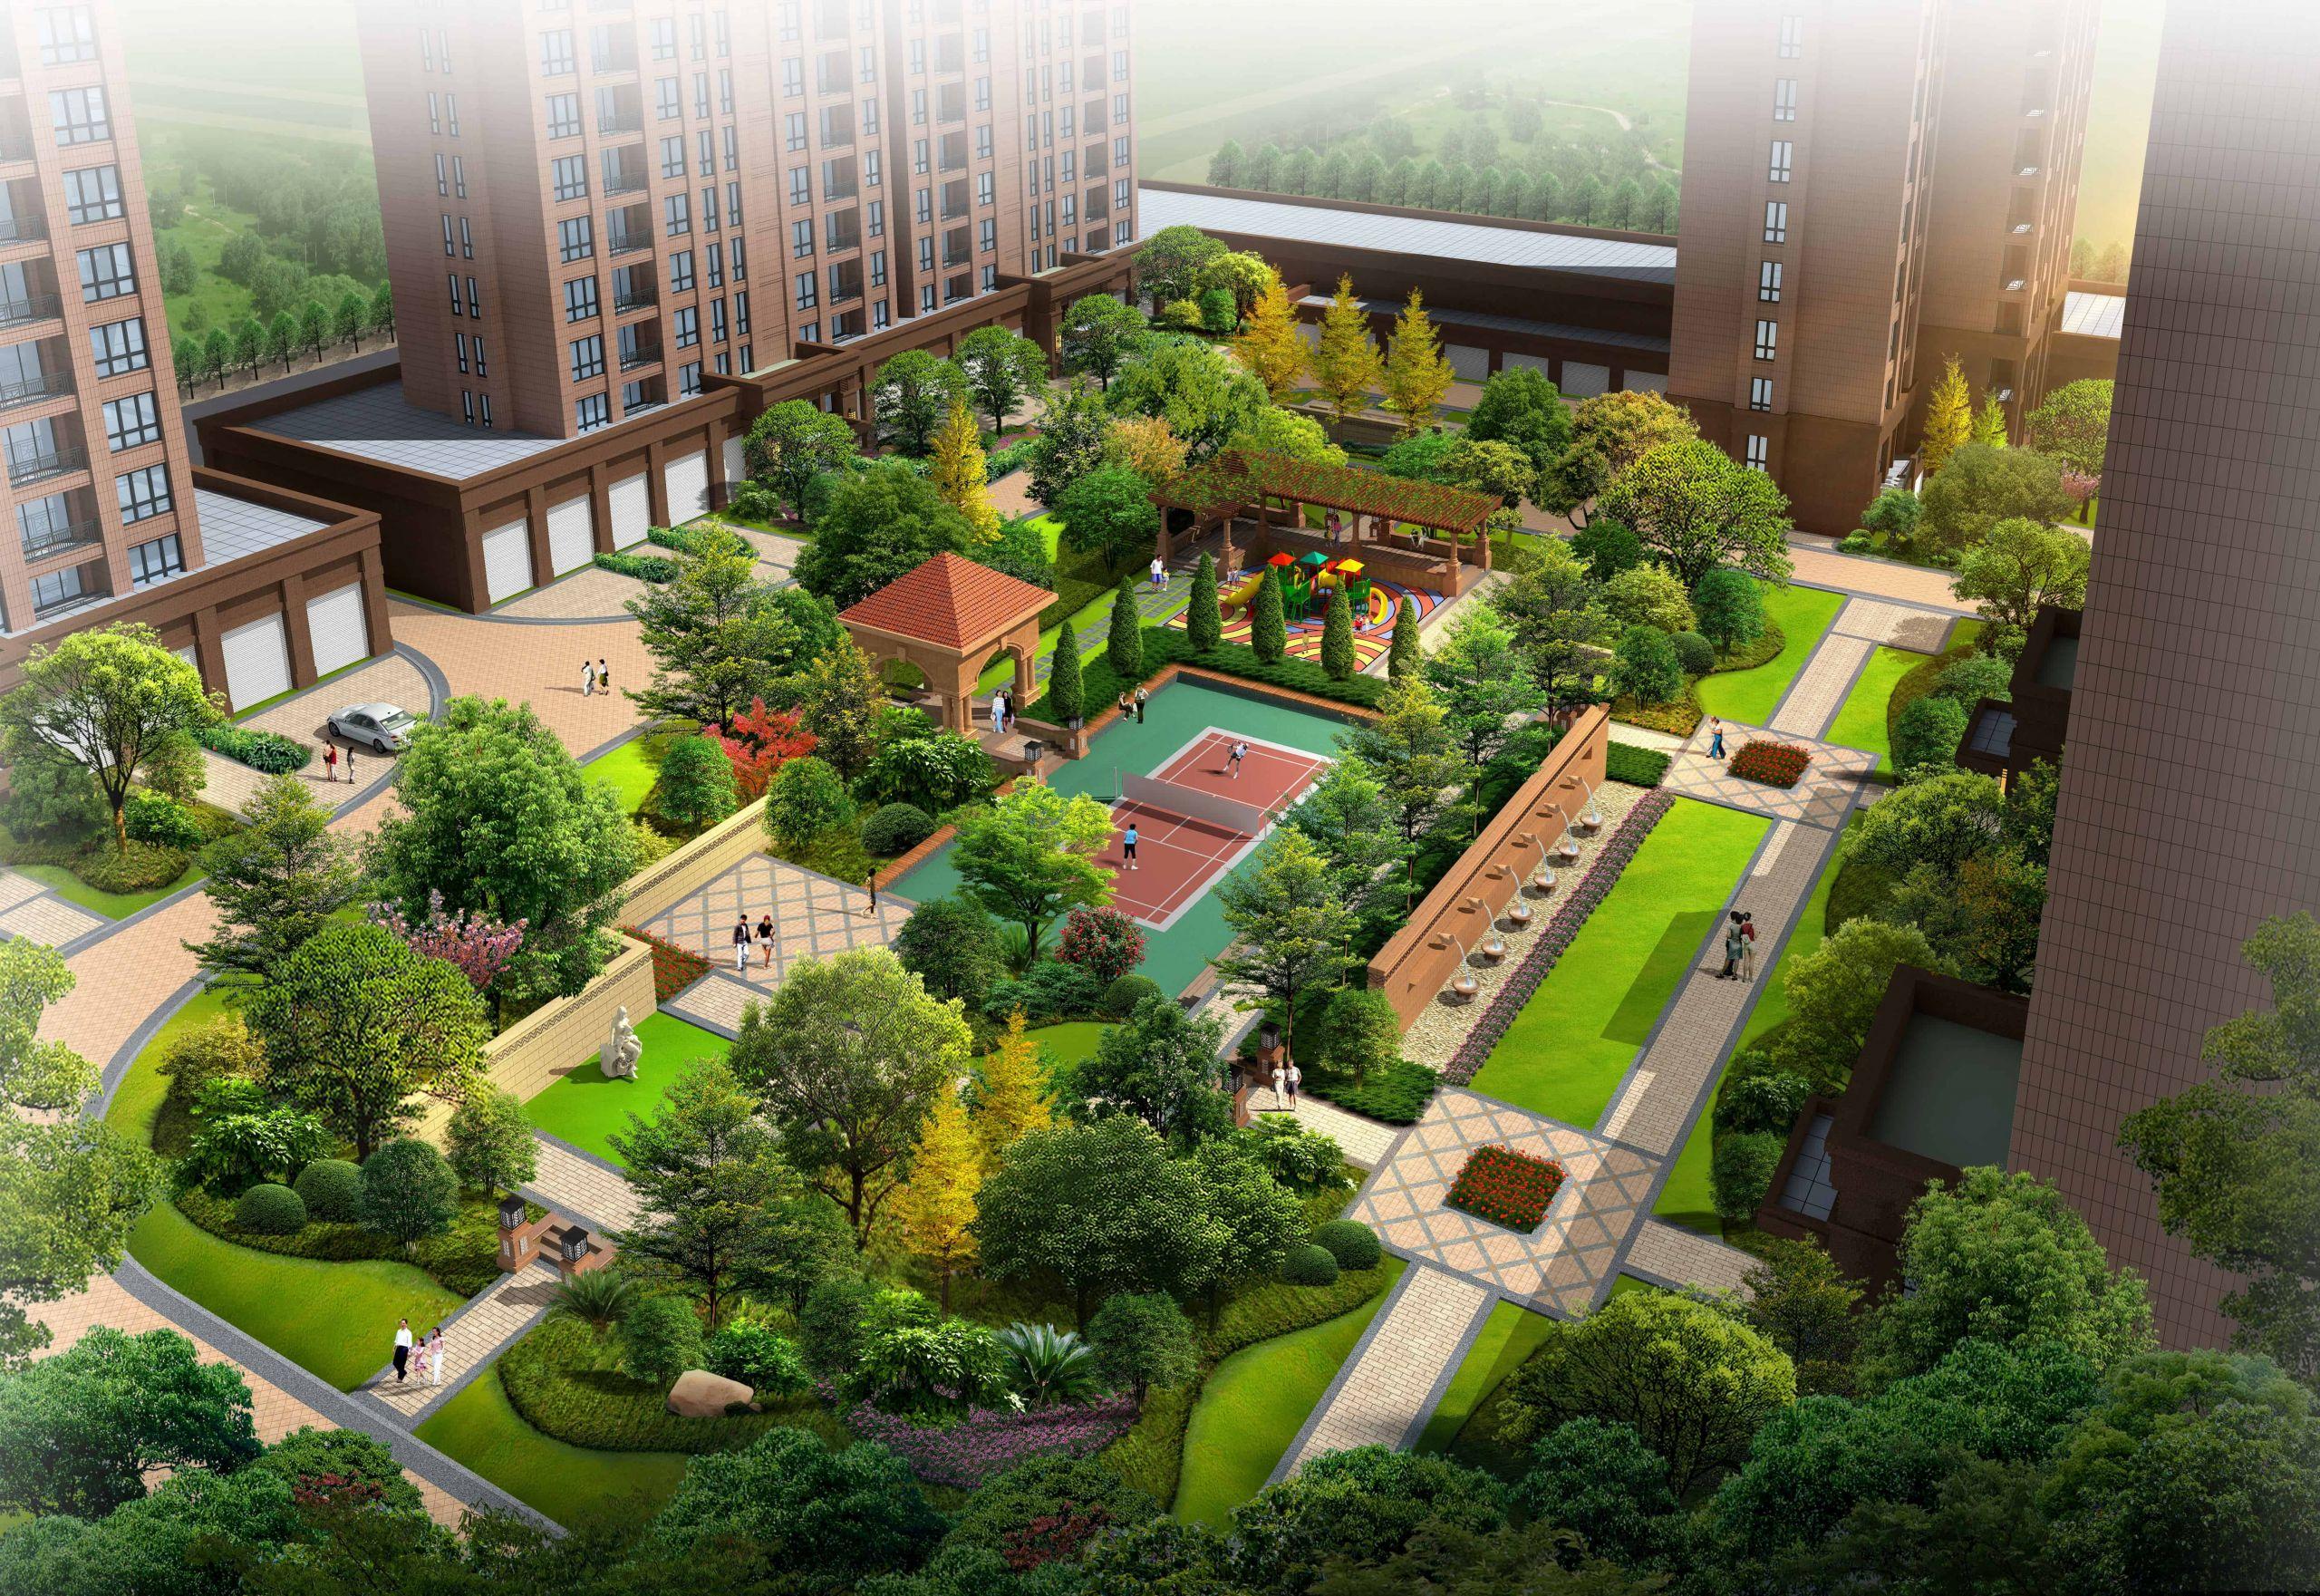 Landscape Architecture Design  TOP LANDSCAPE ARCHITECT FOR HOUSING AND TOWNSHIP DESIGN IN